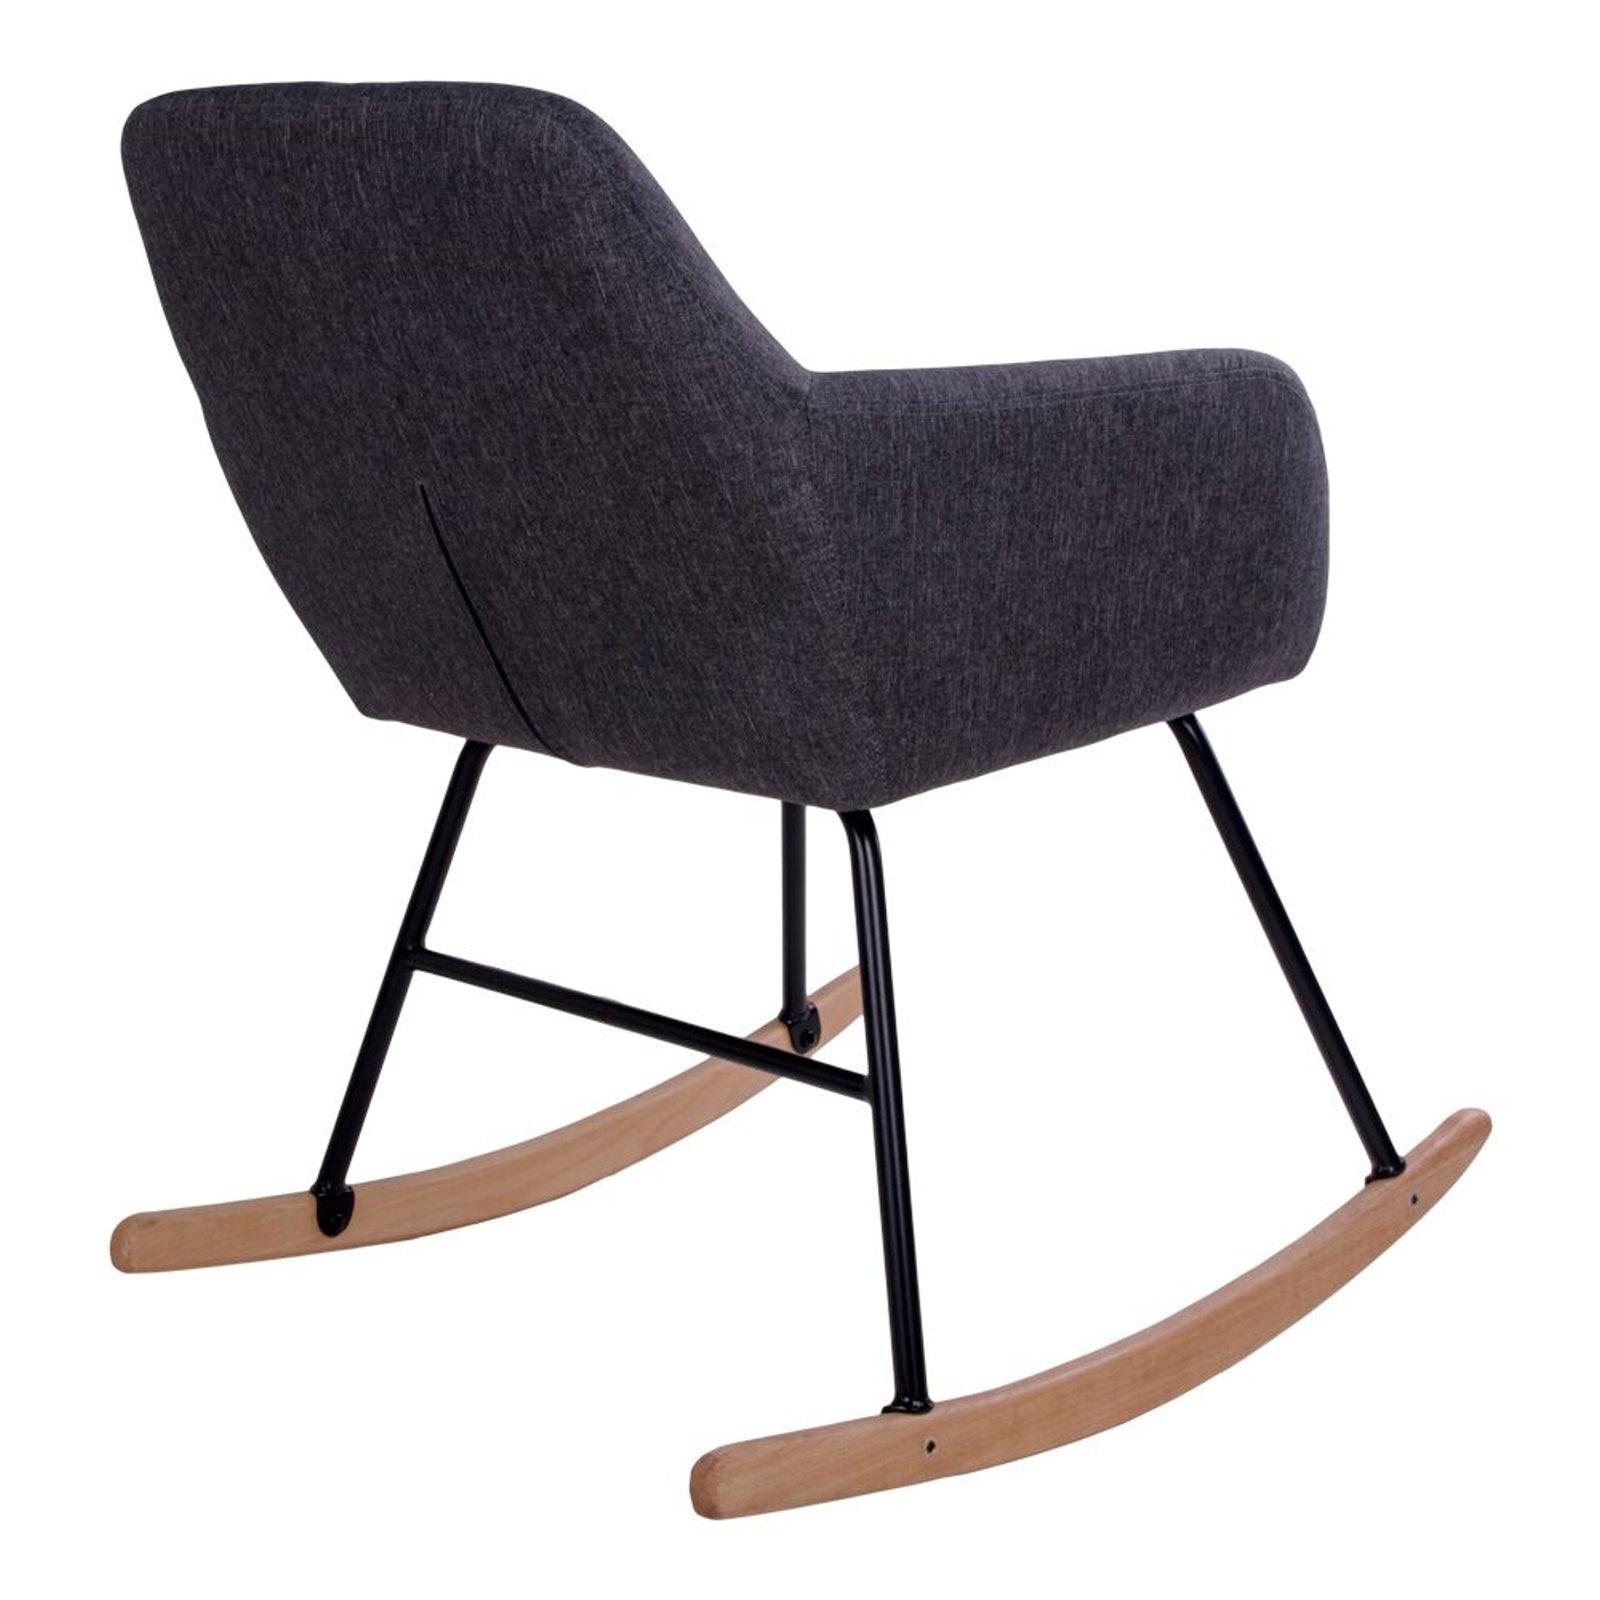 pkline schaukelstuhl yma in grau stuhl sessel schwingstuhl. Black Bedroom Furniture Sets. Home Design Ideas